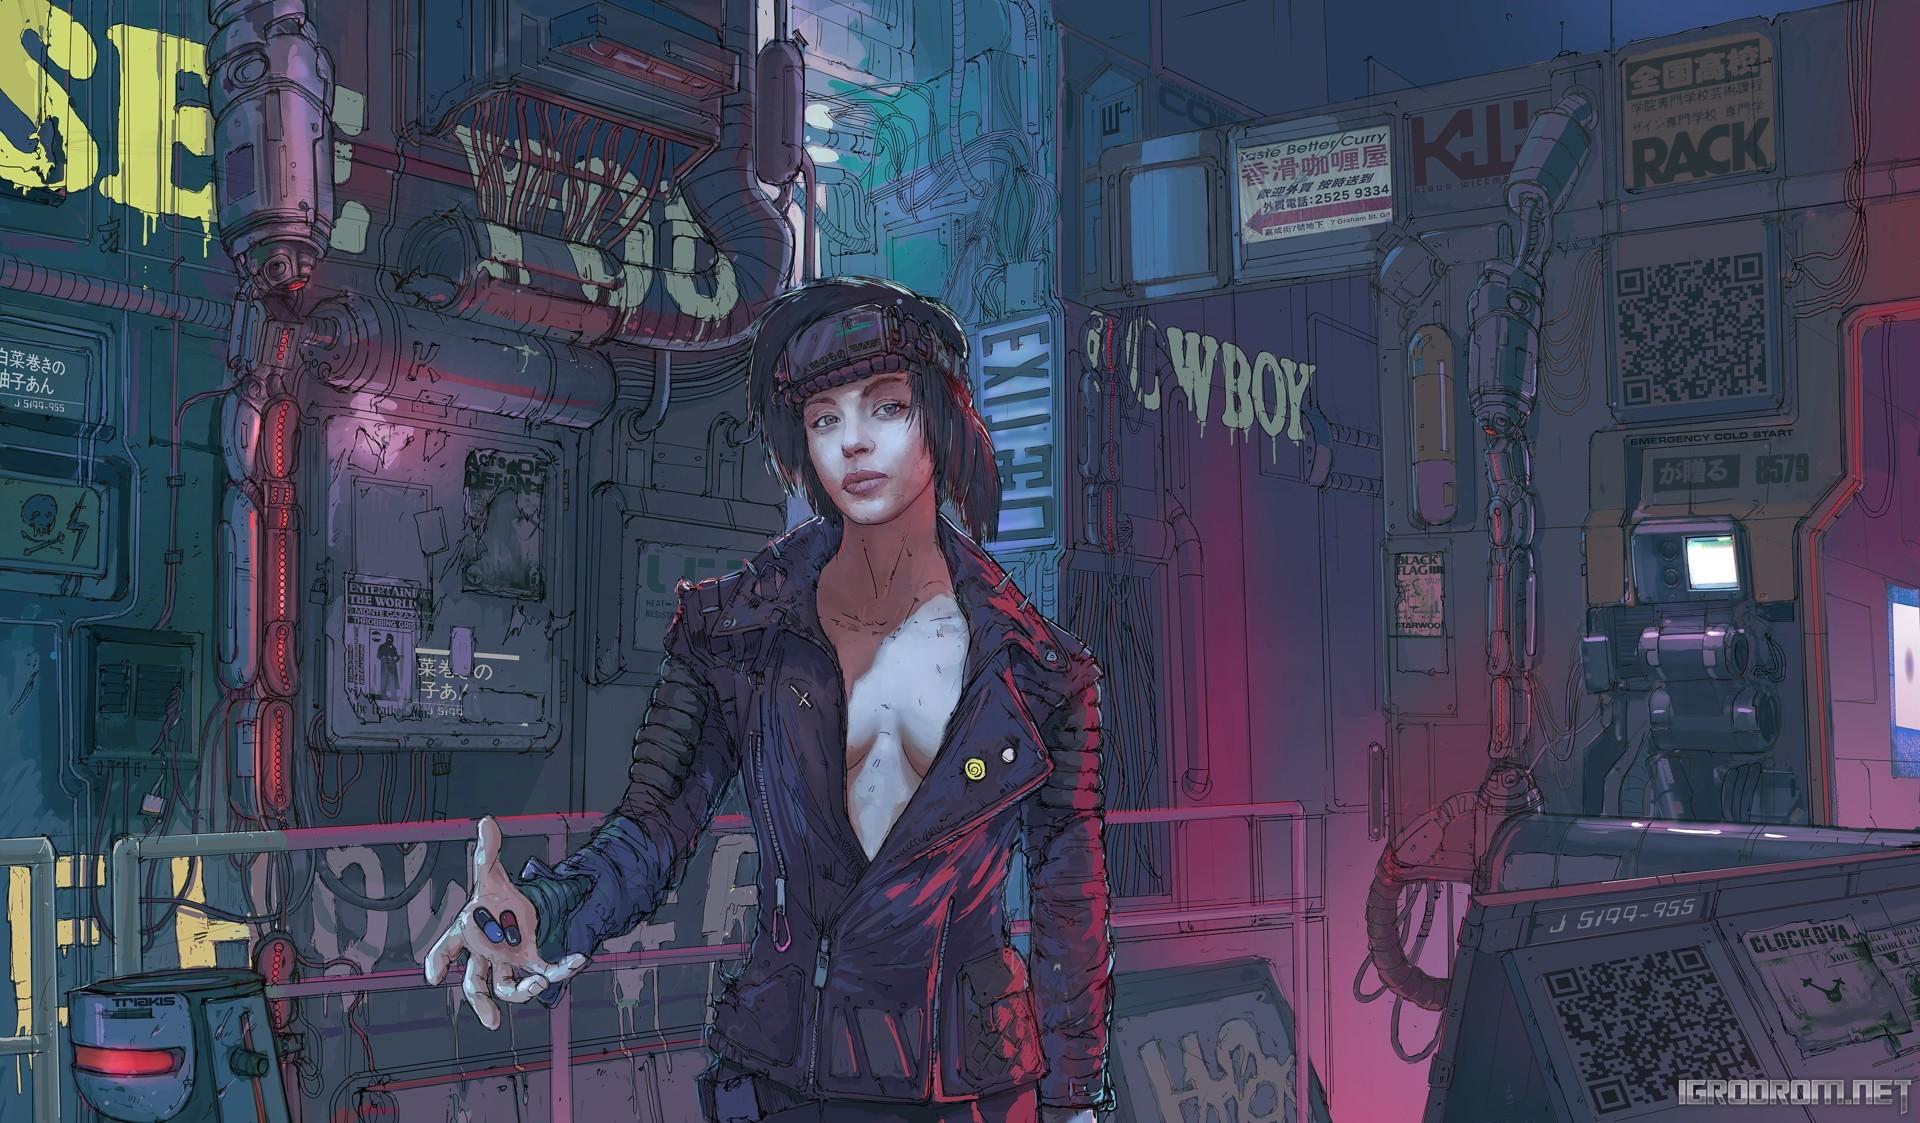 Концепт-арты Cyberpunk 2077 142